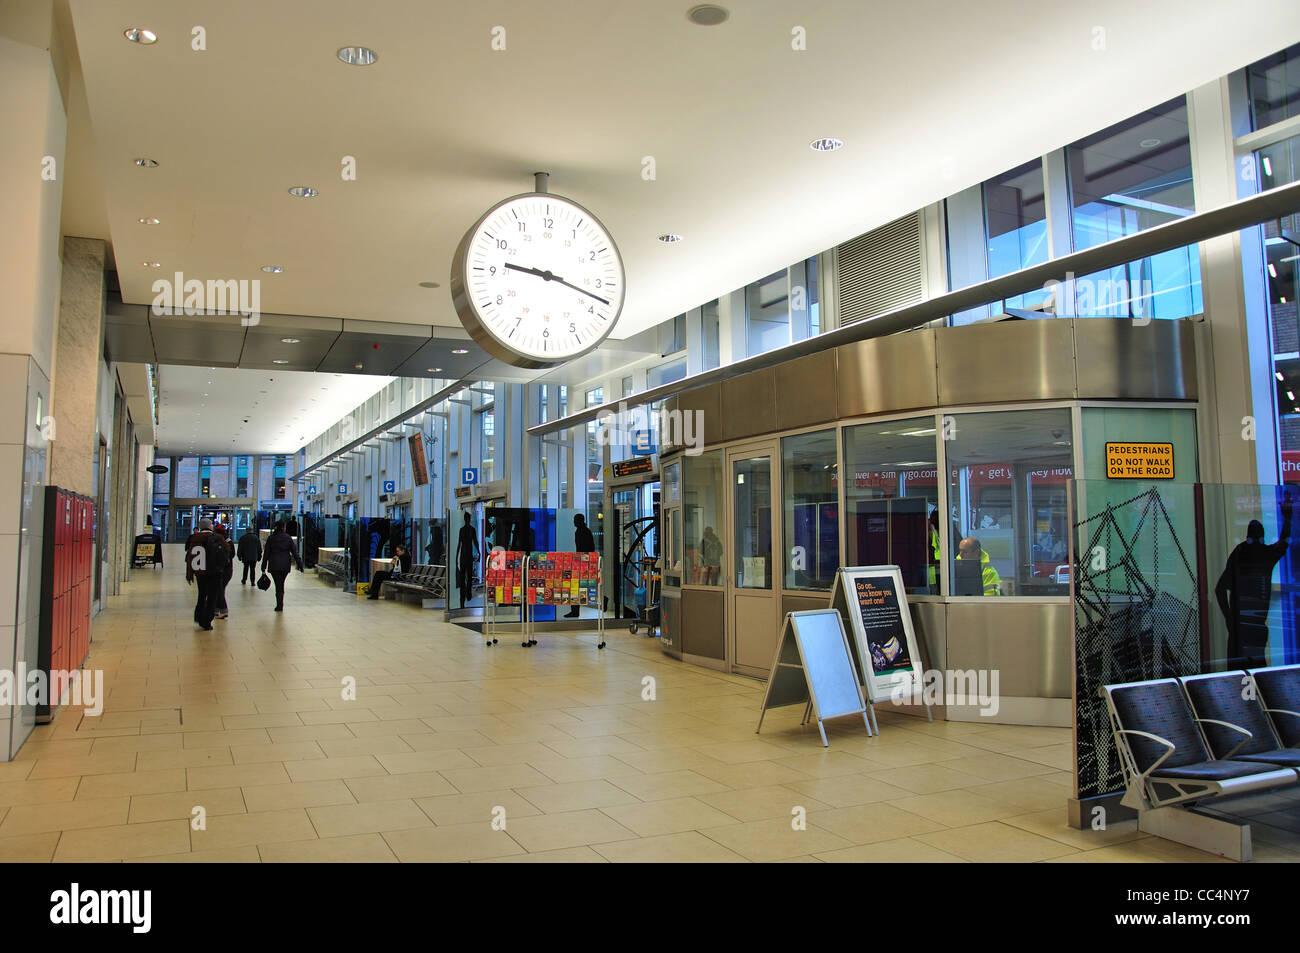 Bus Station At Eldon Square Shopping Centre Newcastle Upon Tyne Tyne And Wear England United Kingdom